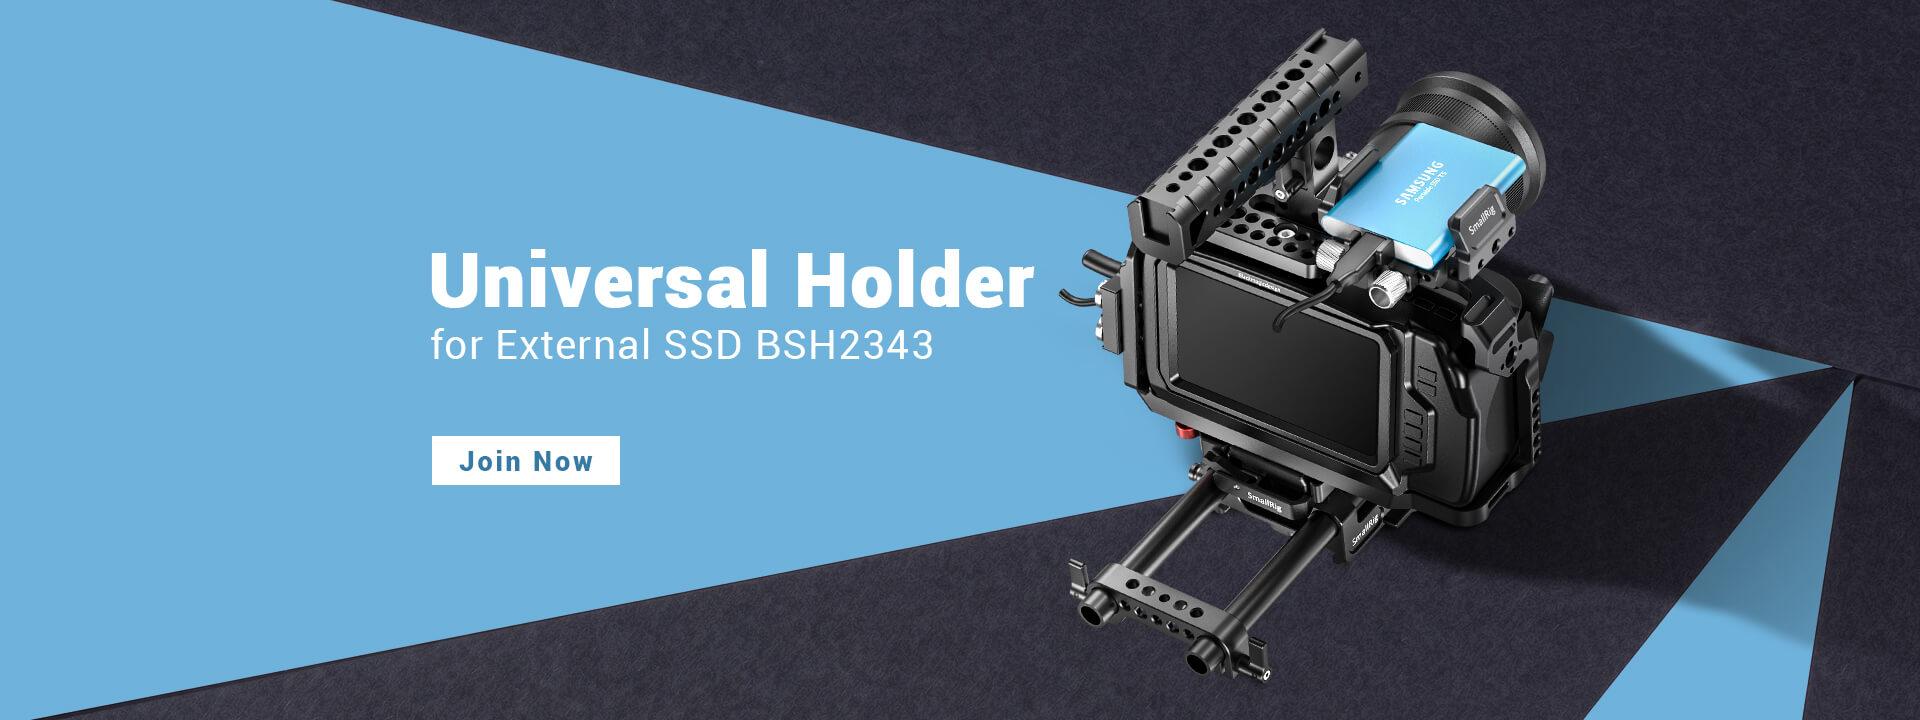 SMALLRIG UNIVERSAL HOLDER FOR EXTERNAL SSD BSH2343